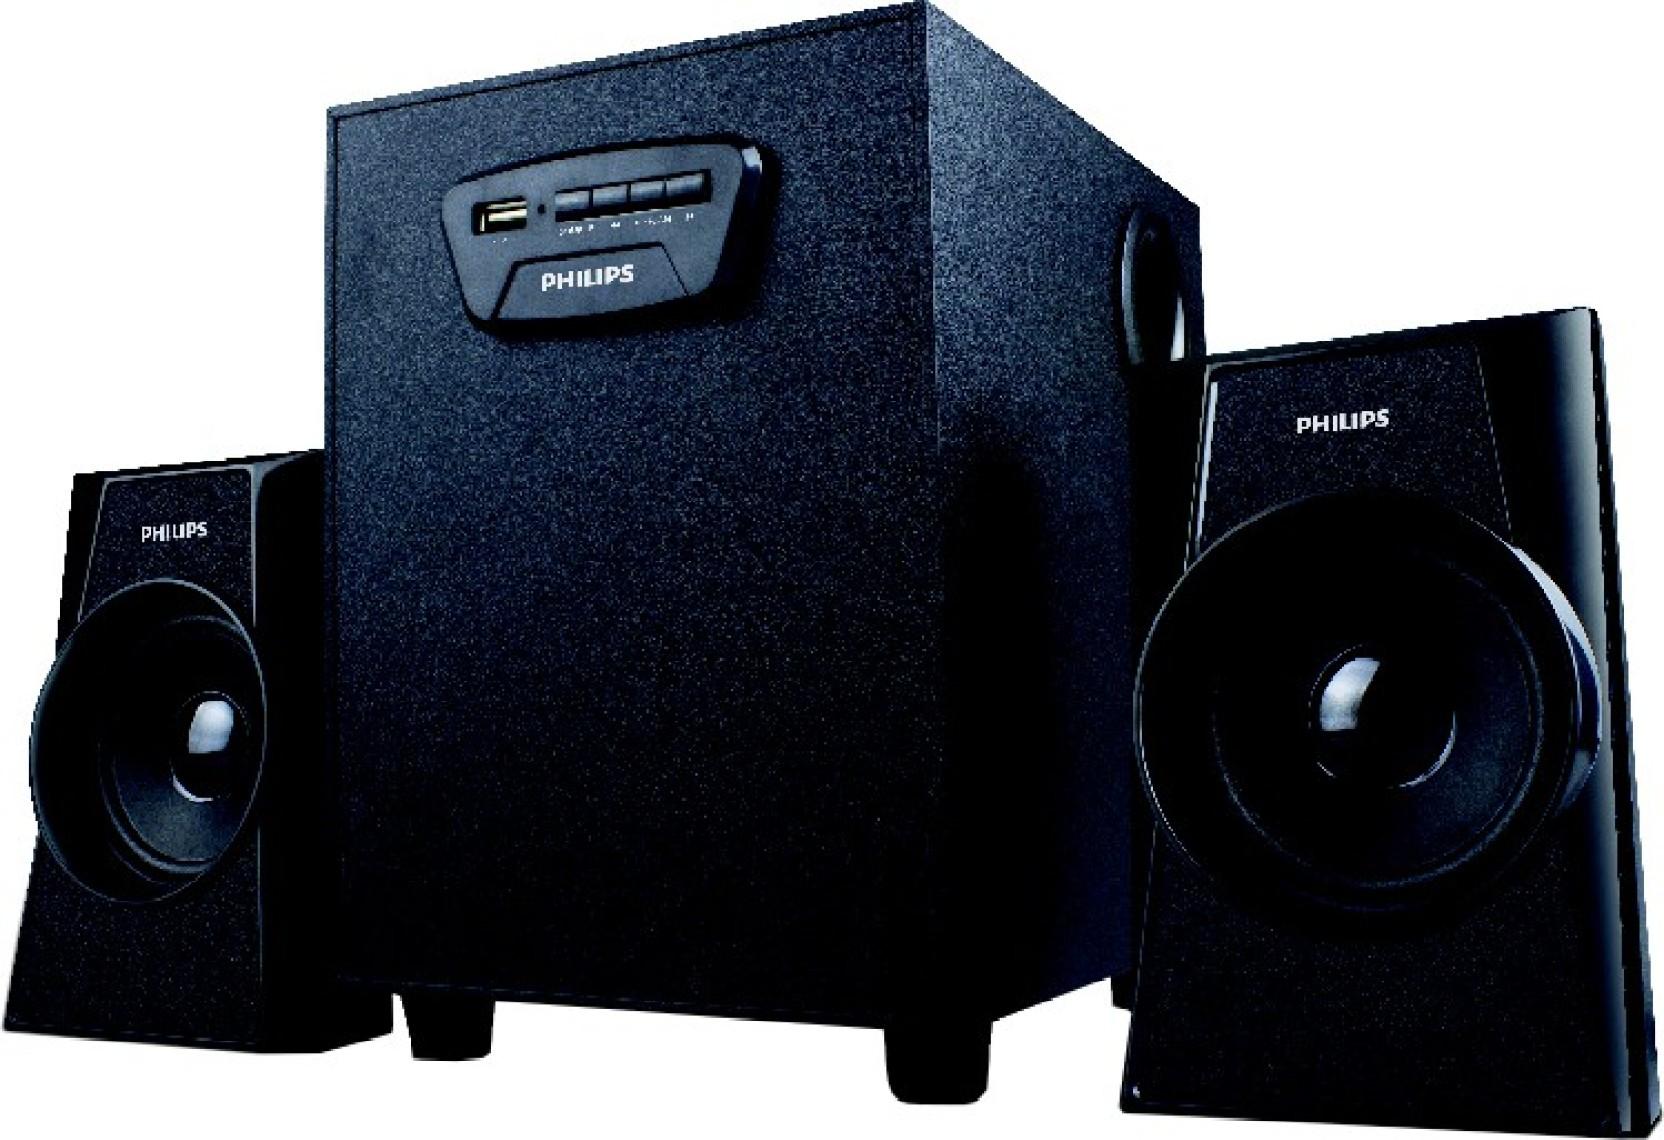 buy philips mms 1400 94 10 w laptop desktop speaker online from rh flipkart com Philips MMS MP 60 Philips Module Repair